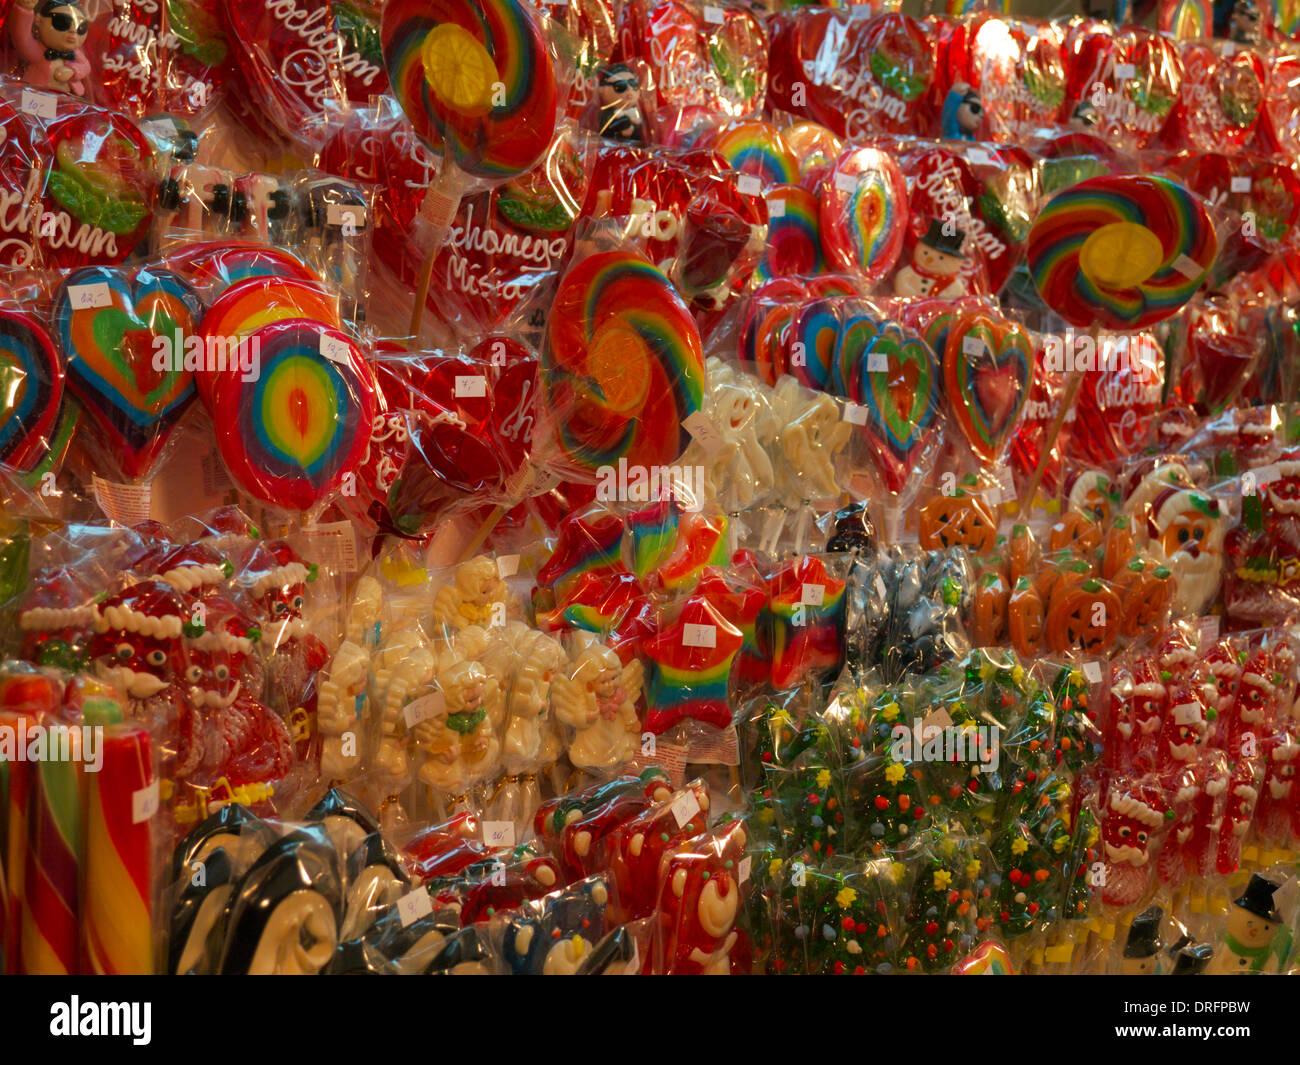 Colorful Lollipops Stockfotos & Colorful Lollipops Bilder - Alamy